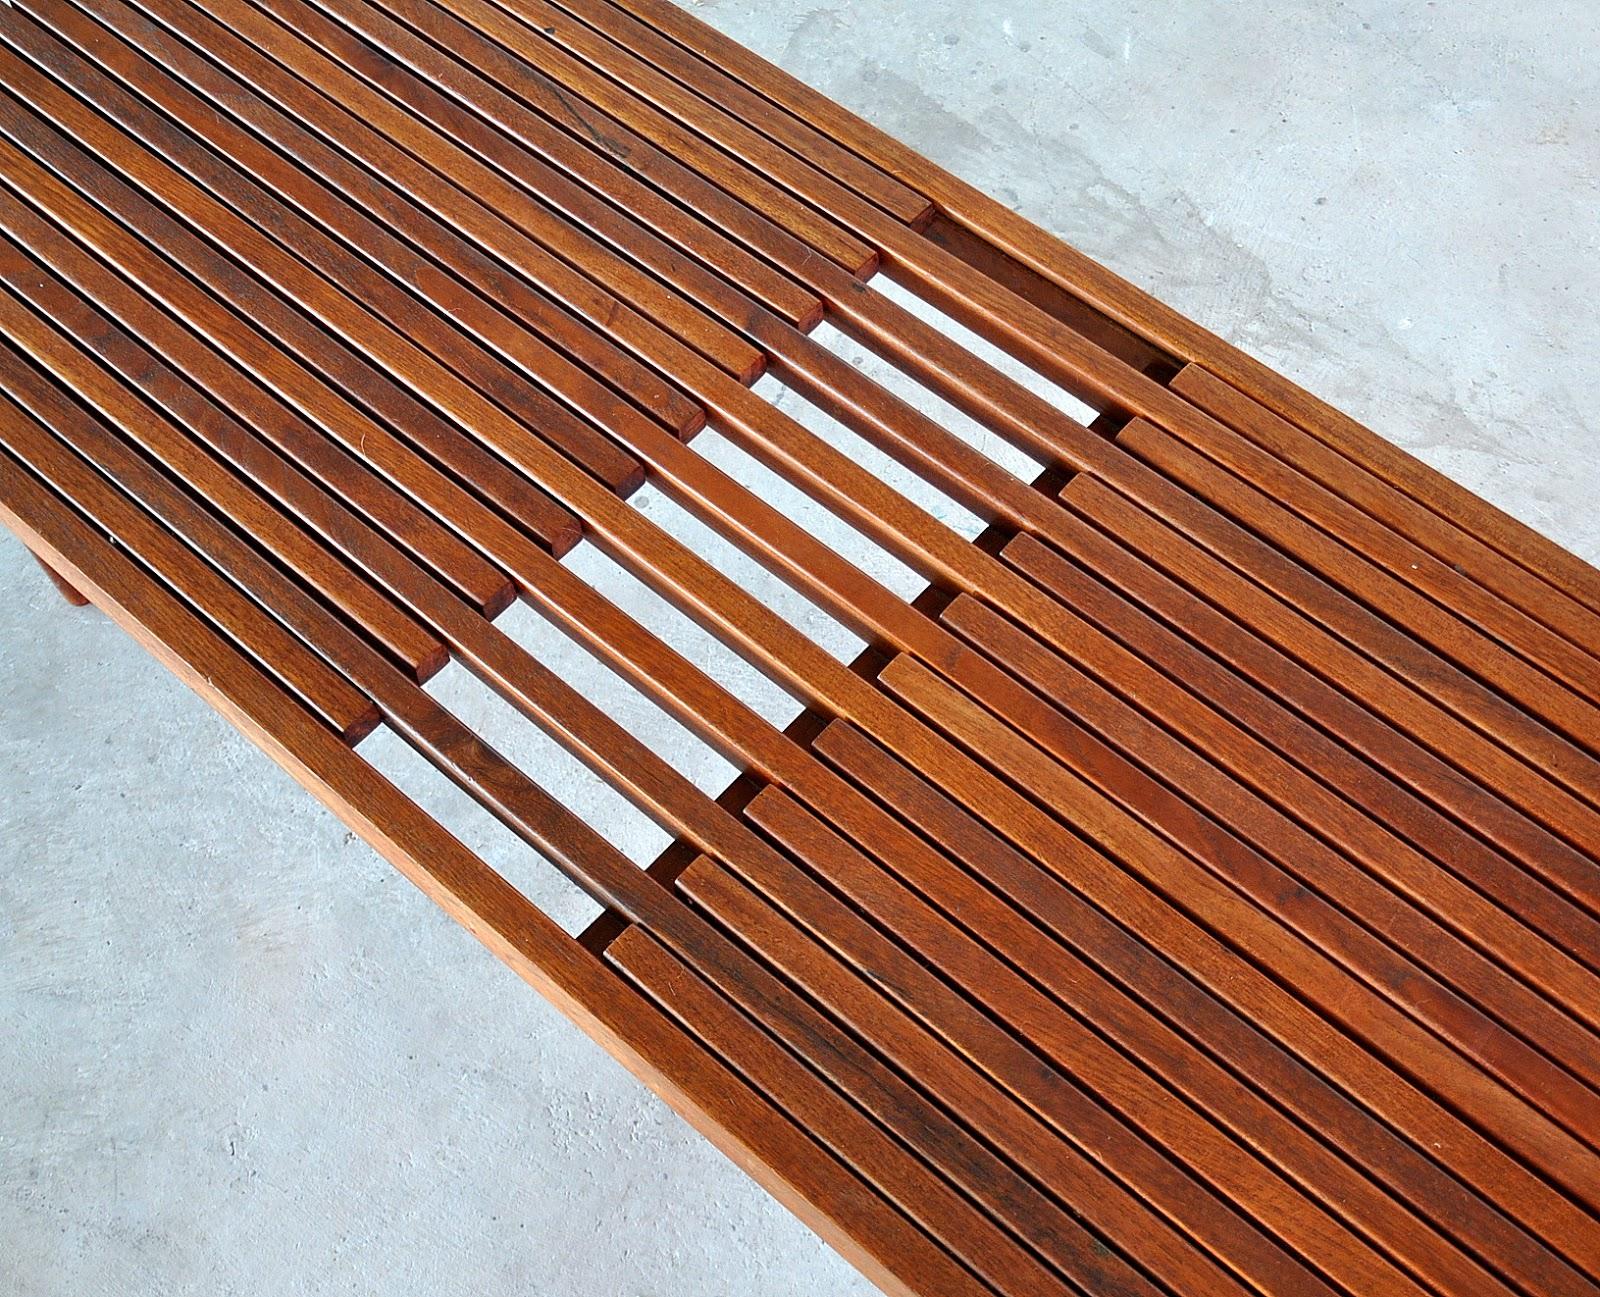 Select Modern Brown Saltman Expandable Teak Slat Bench Or Coffee Table